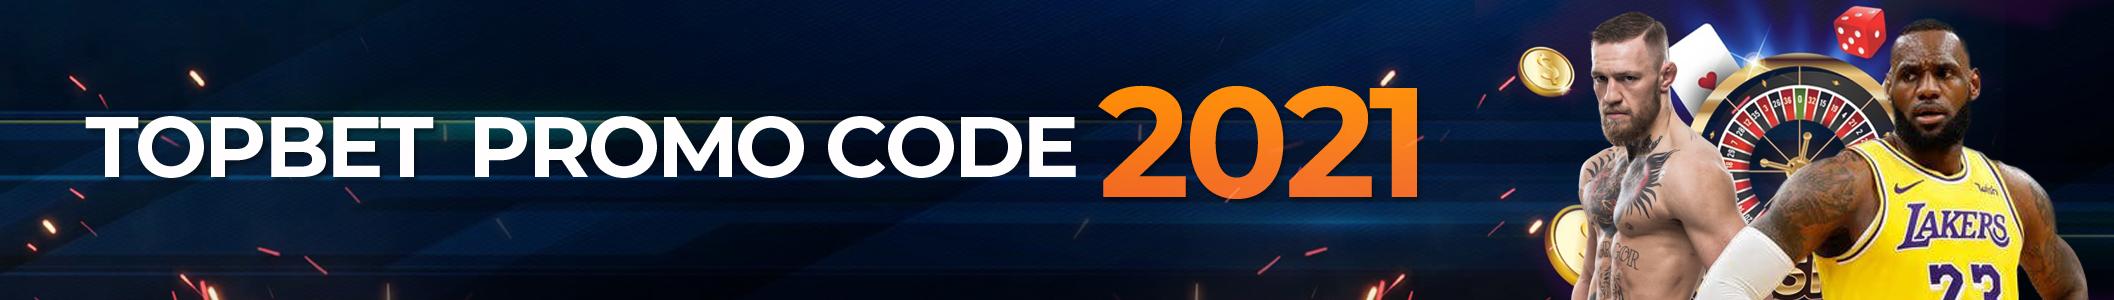 TopBet Promo Code 2021 Sportsbook and Casino